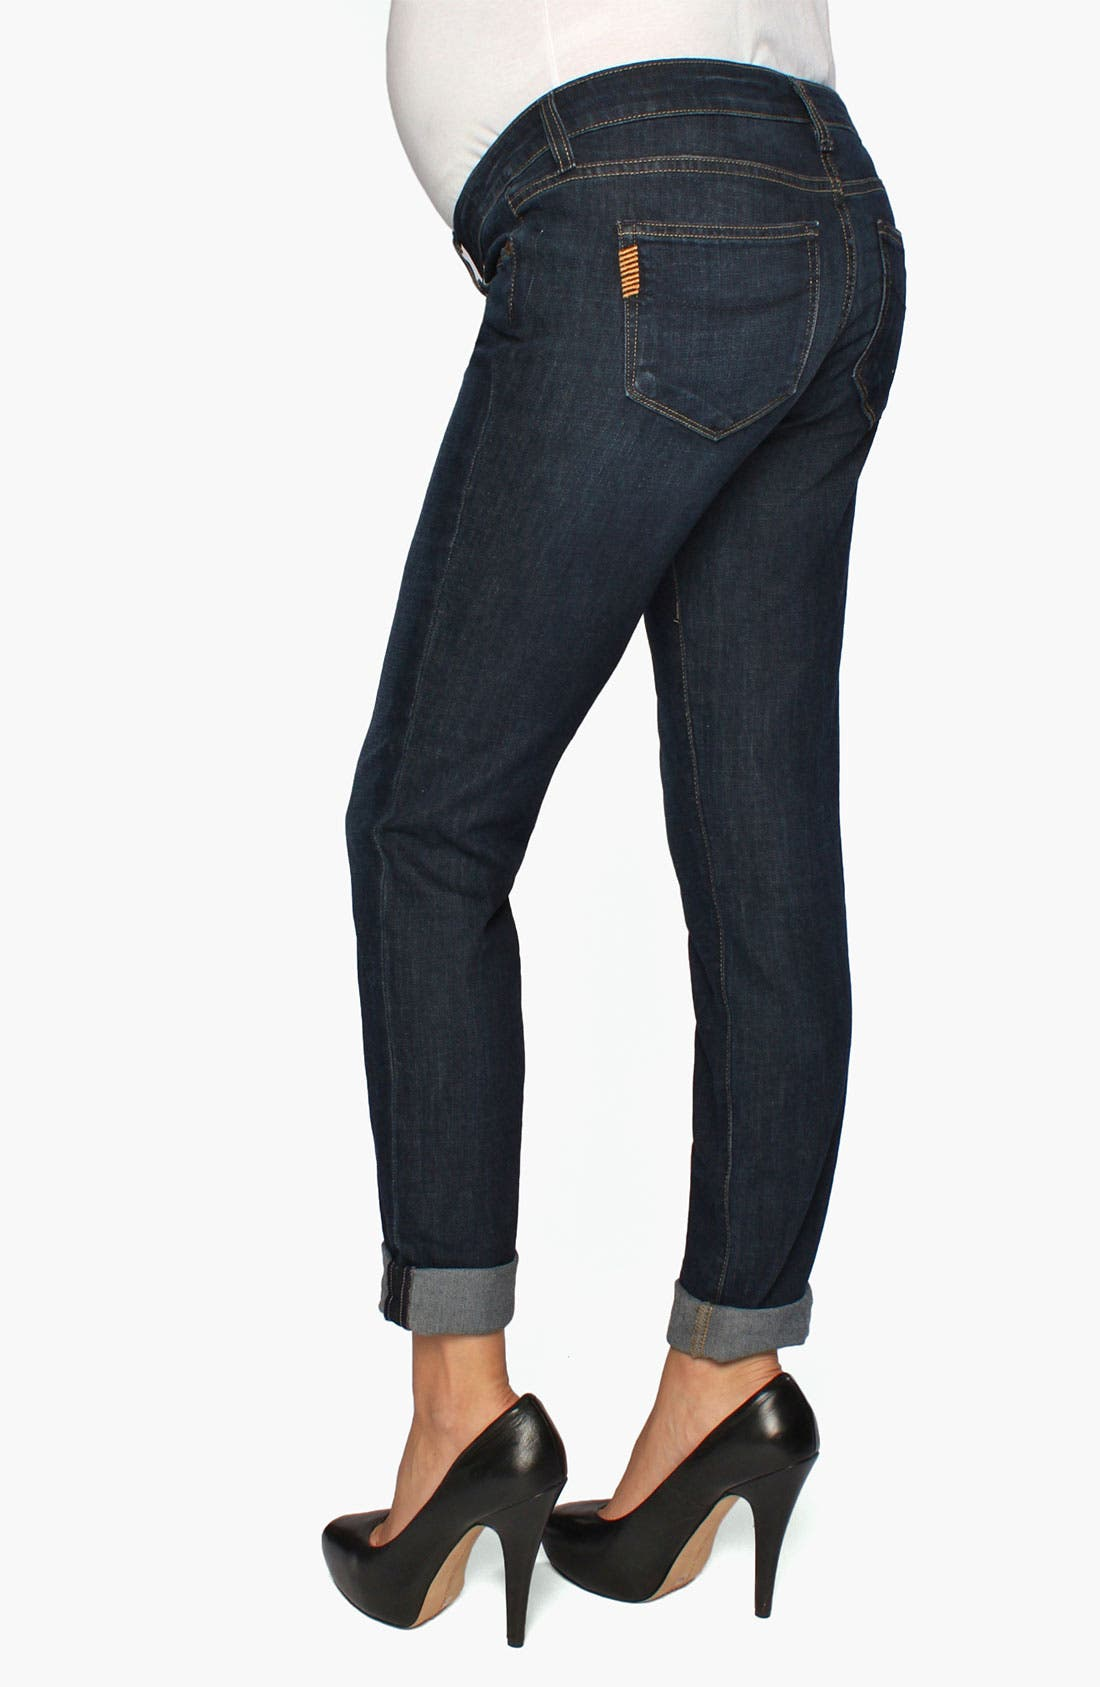 Alternate Image 1 Selected - Paige Denim 'Jimmy Jimmy Westbourne' Maternity Skinny Jeans (Gavin)